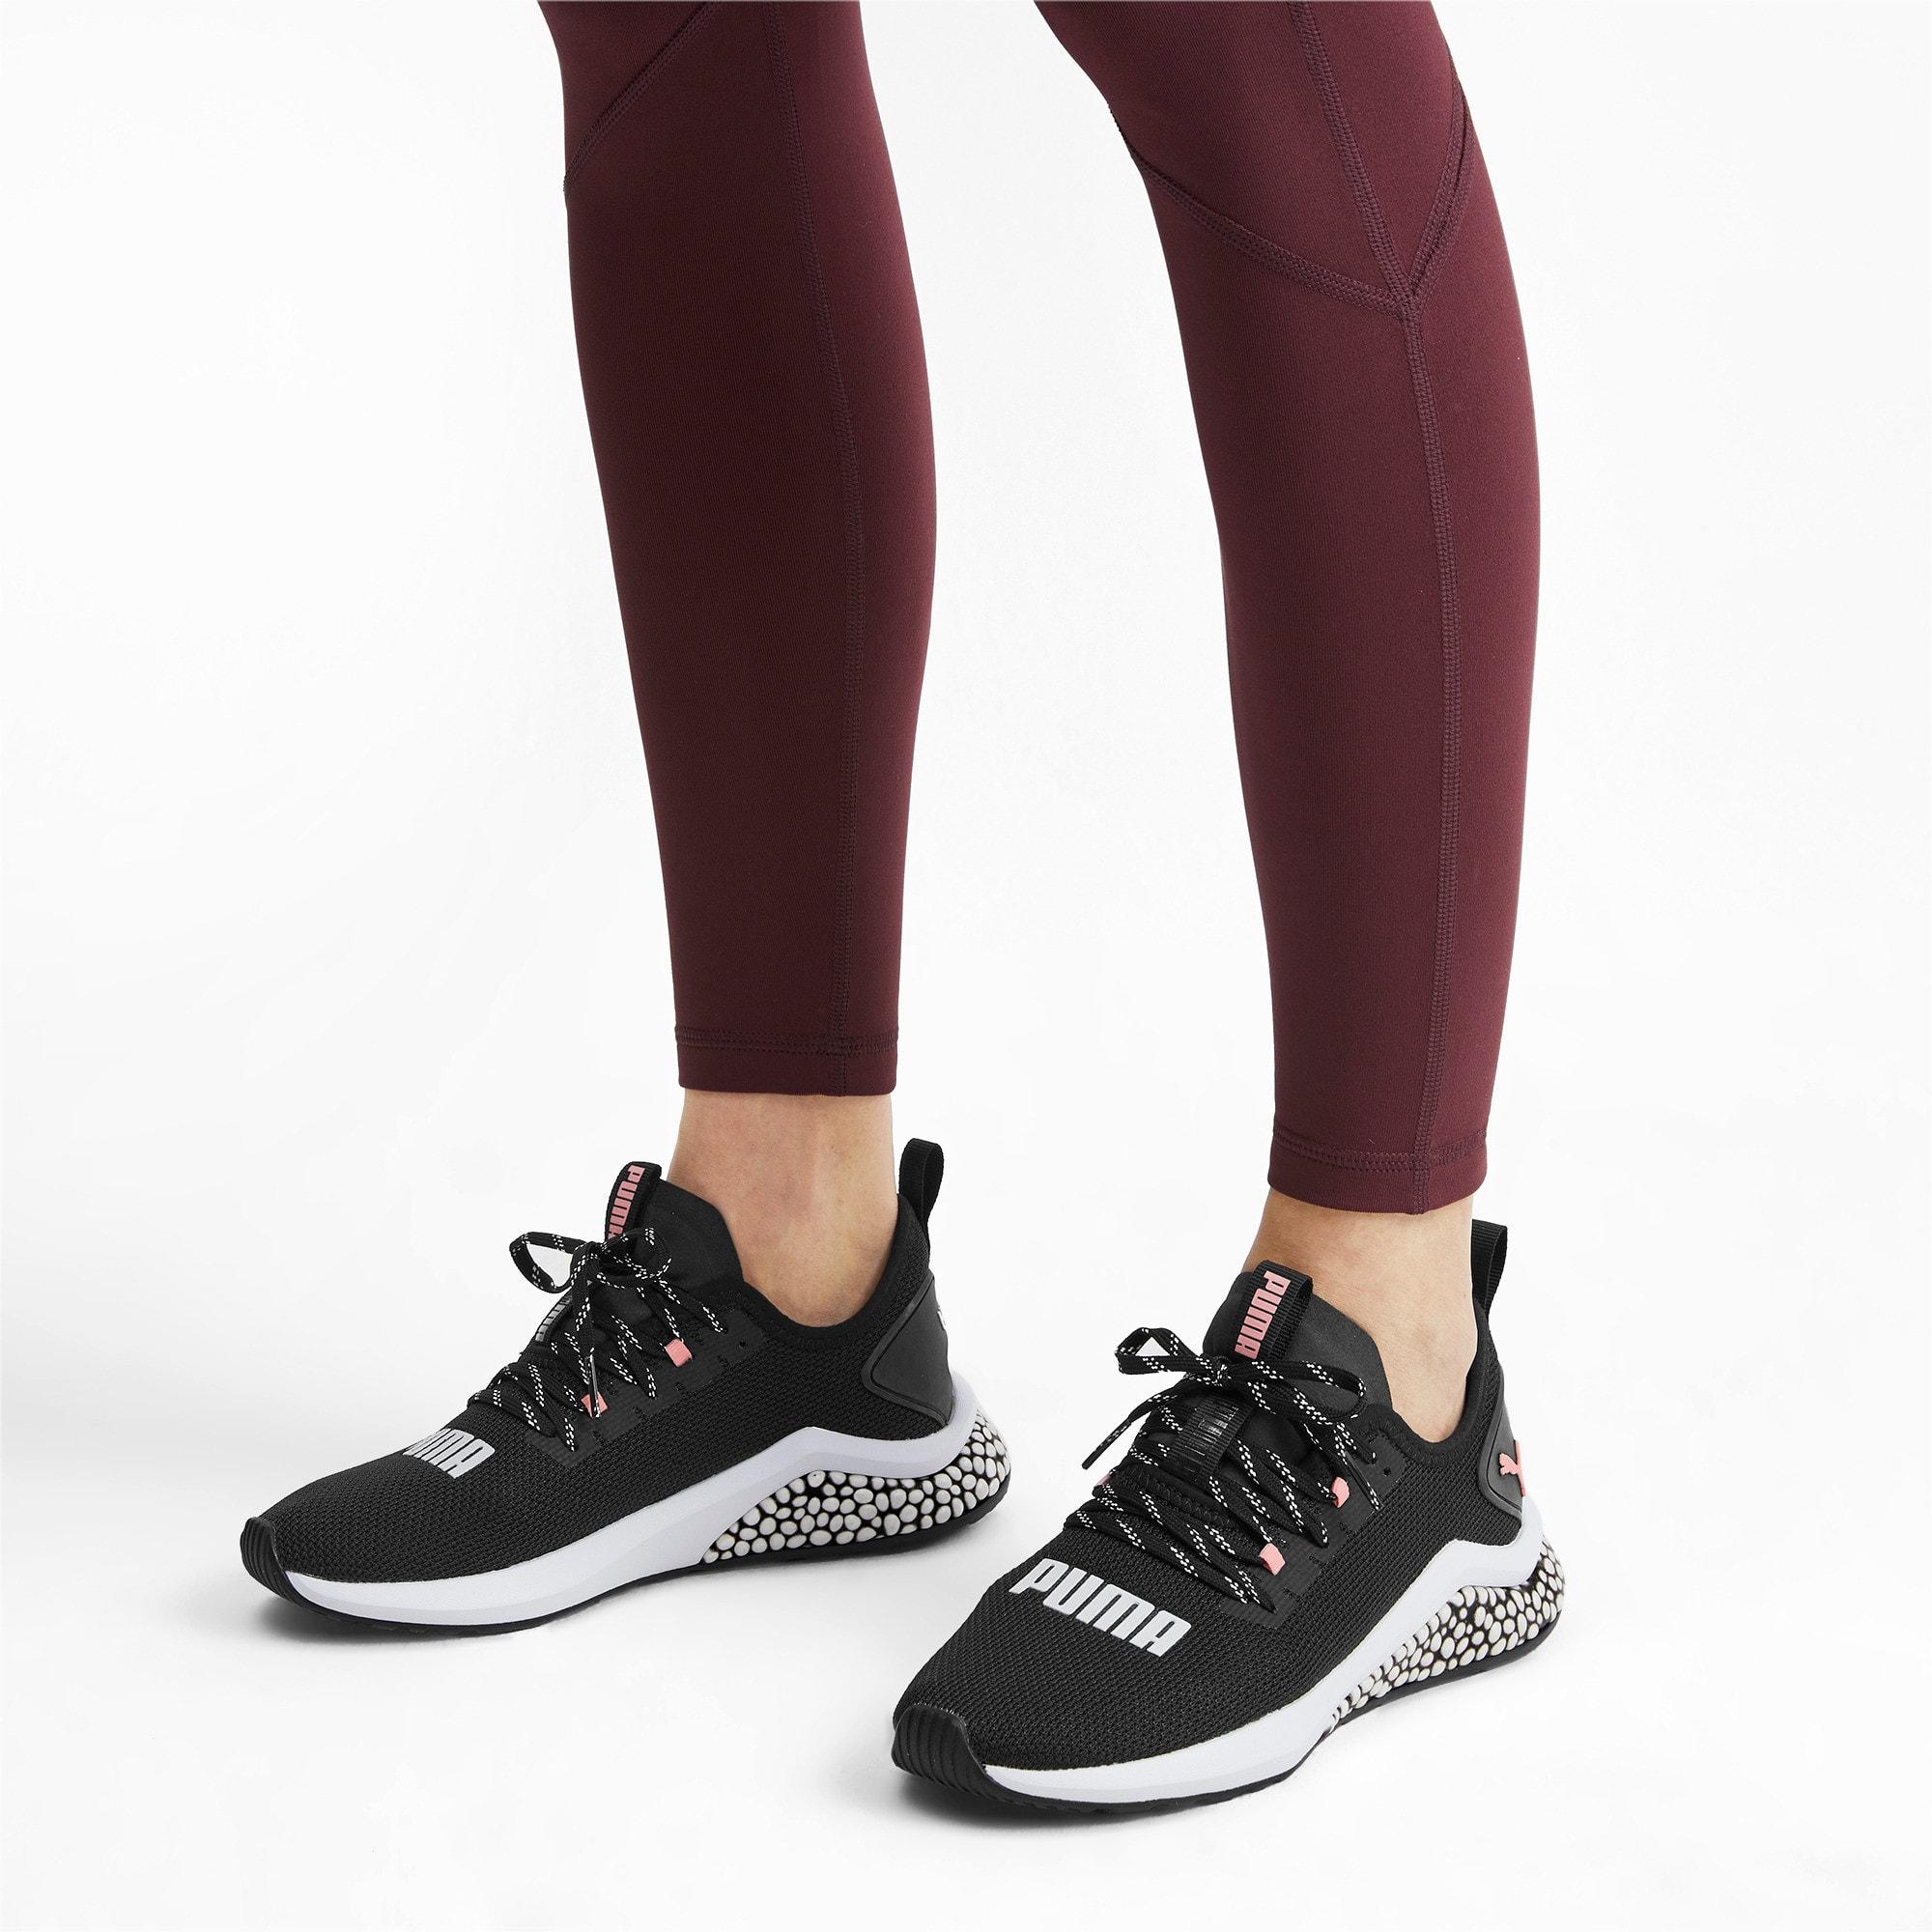 Thumbnail 2 of HYBRID NX Women's Running Shoes, Puma Black-Bridal Rose, medium